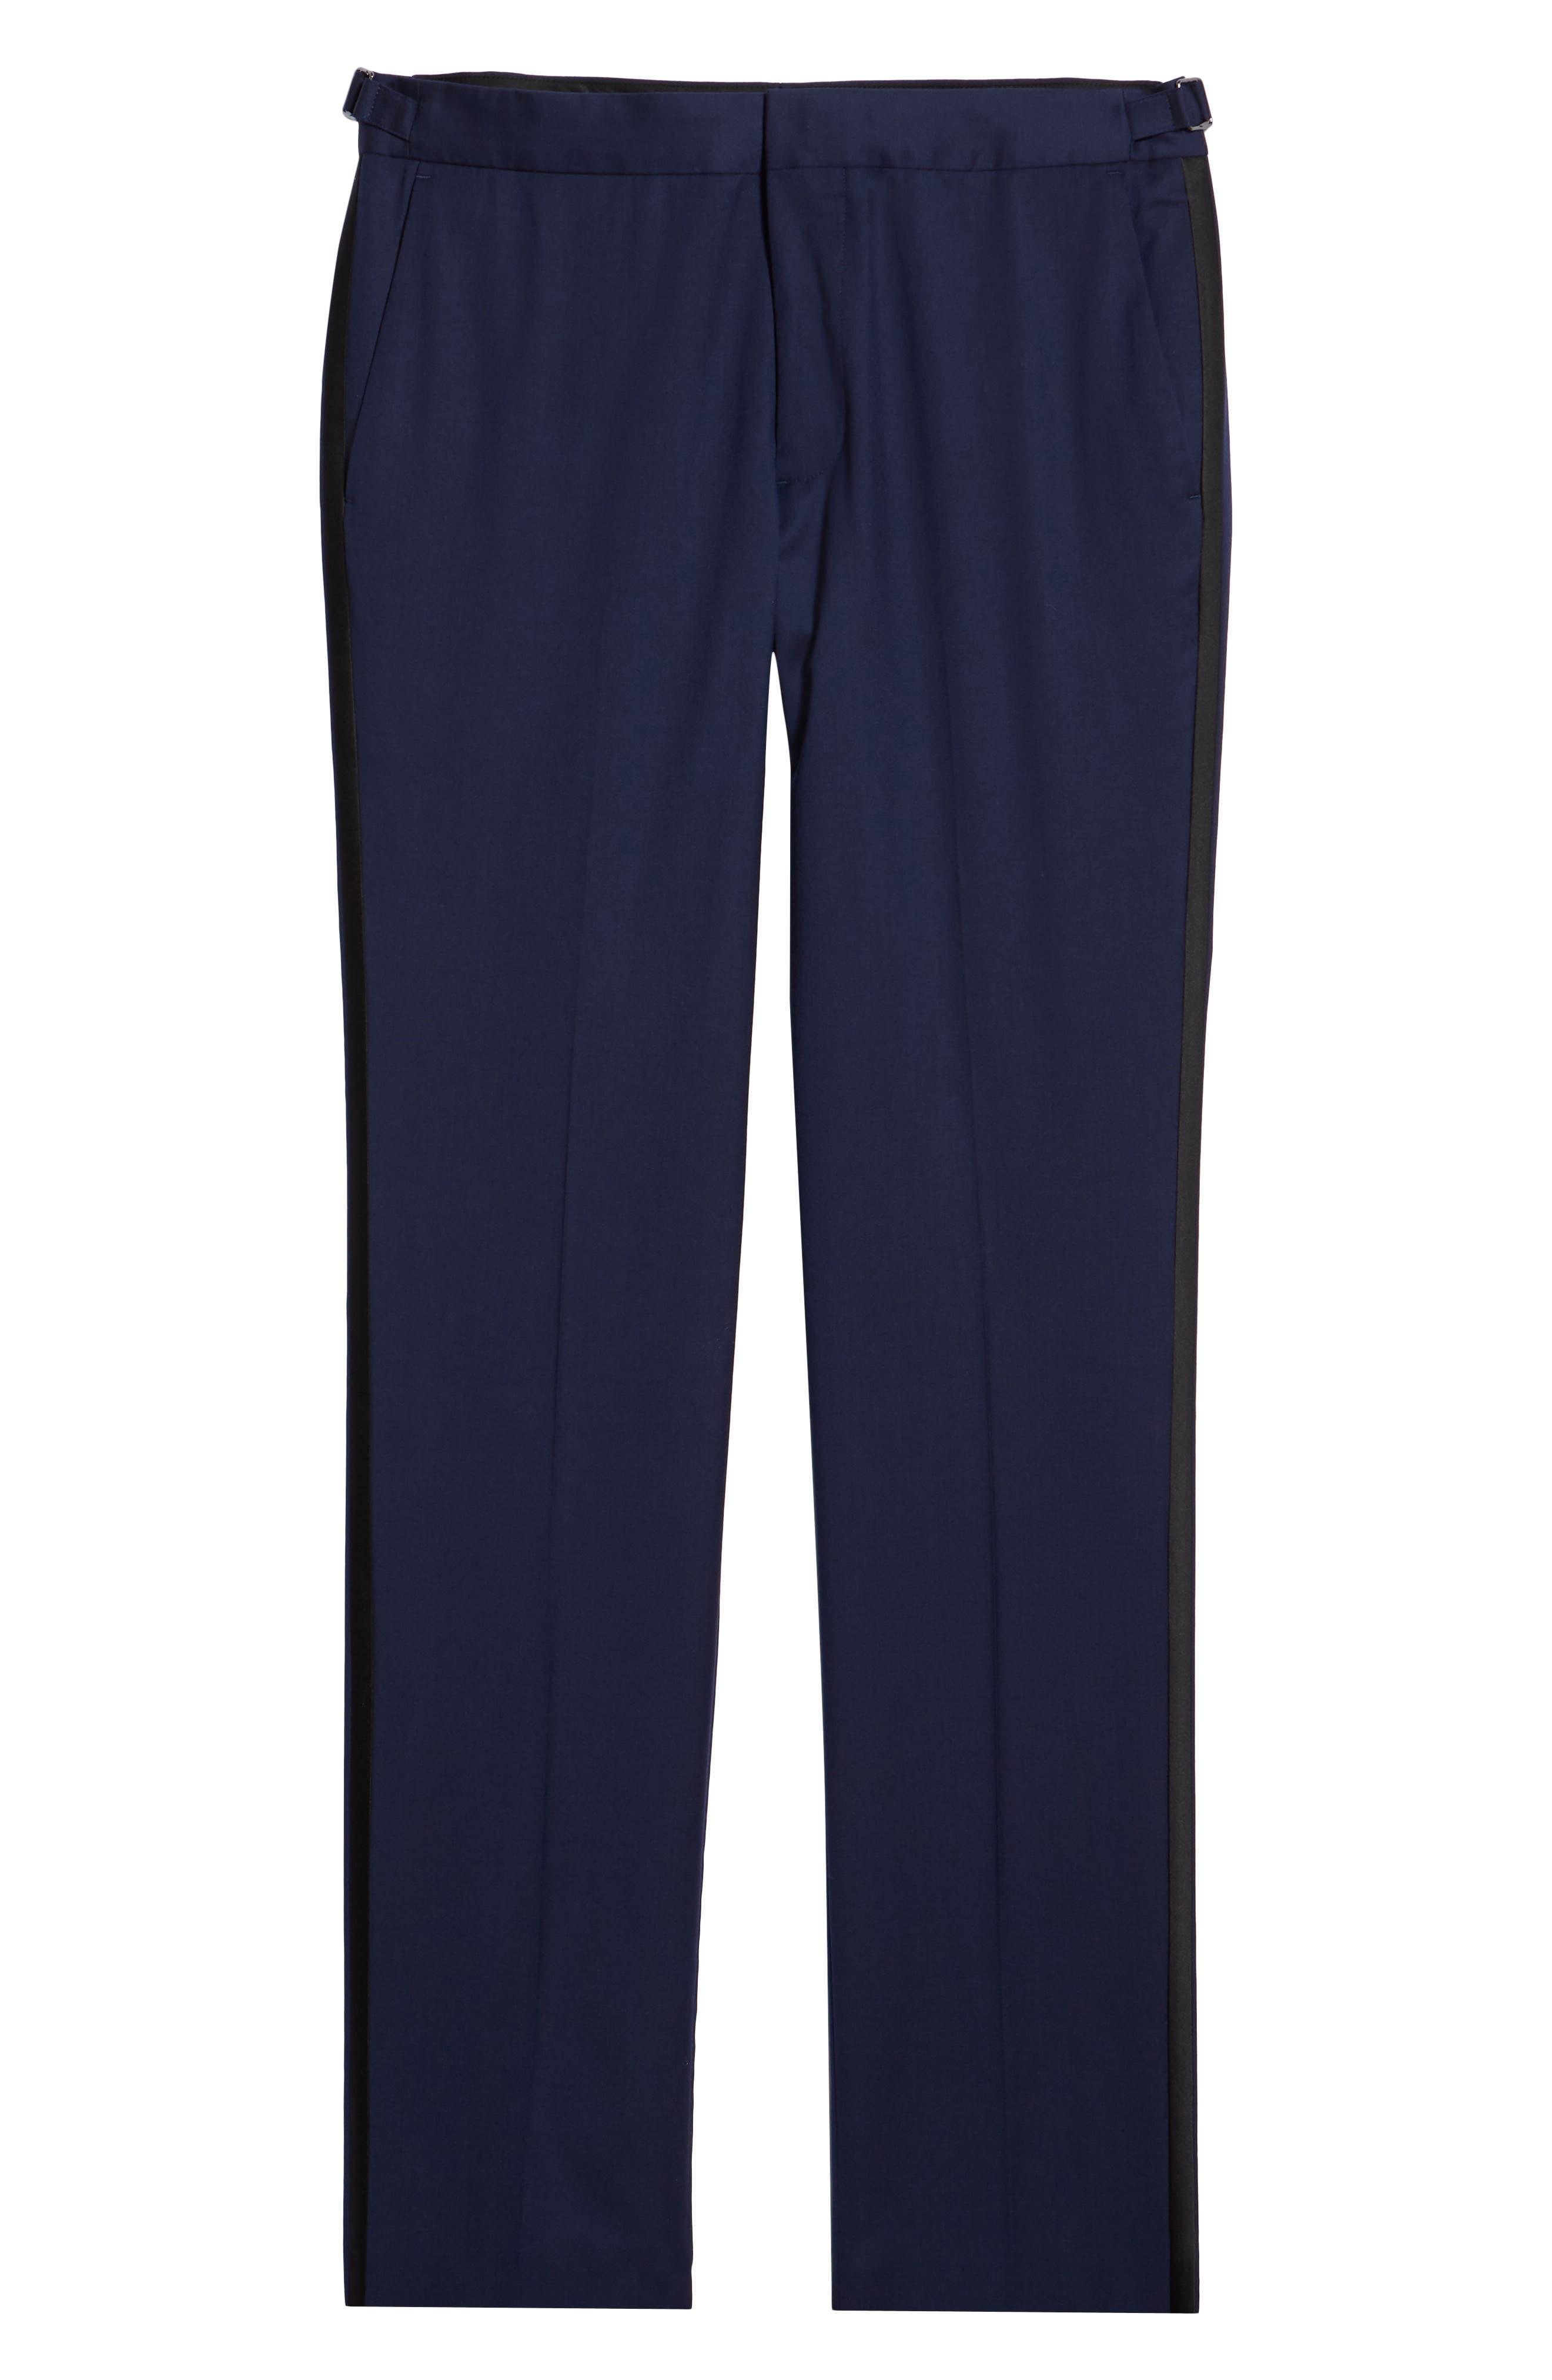 Capstone Slim Fit Tuxedo Trousers,                             Alternate thumbnail 6, color,                             NAVY